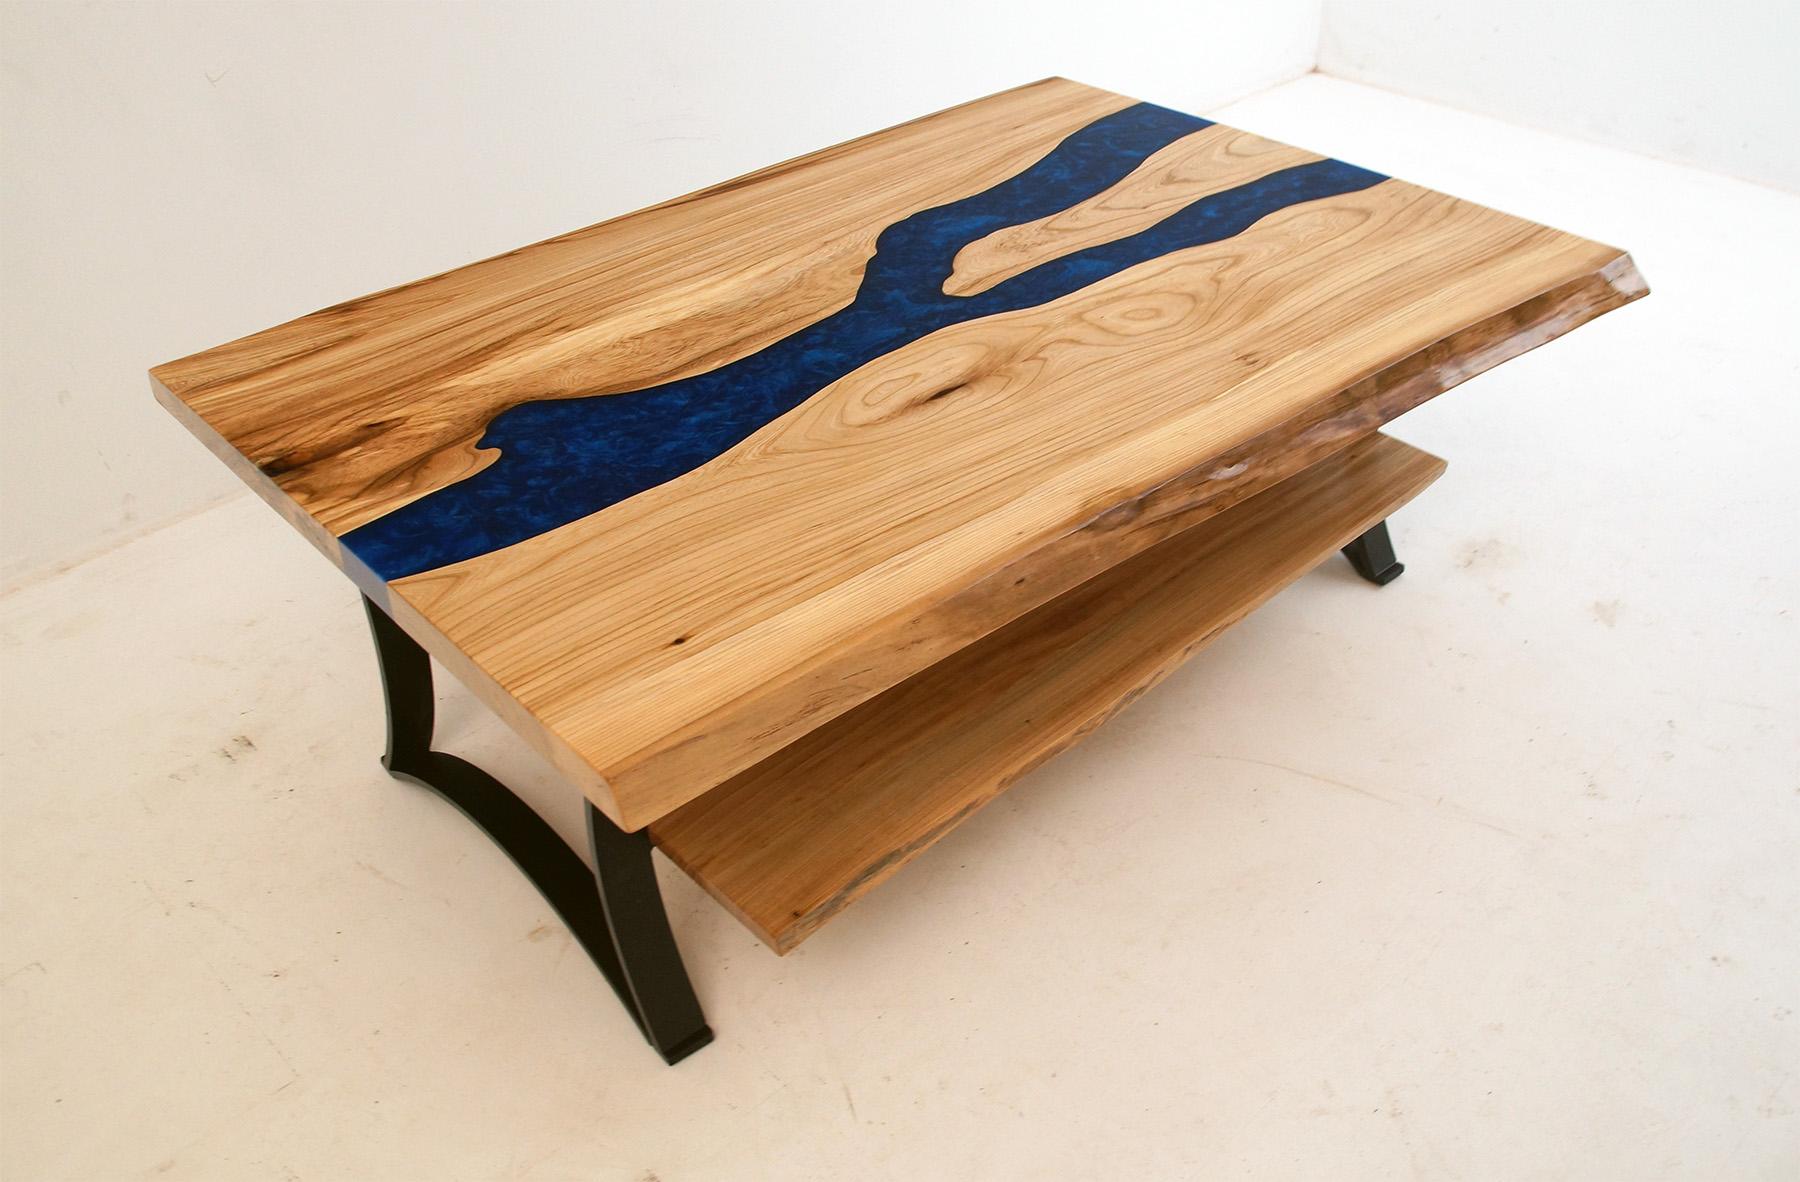 Live Edge Blue River Elm Coffee Table